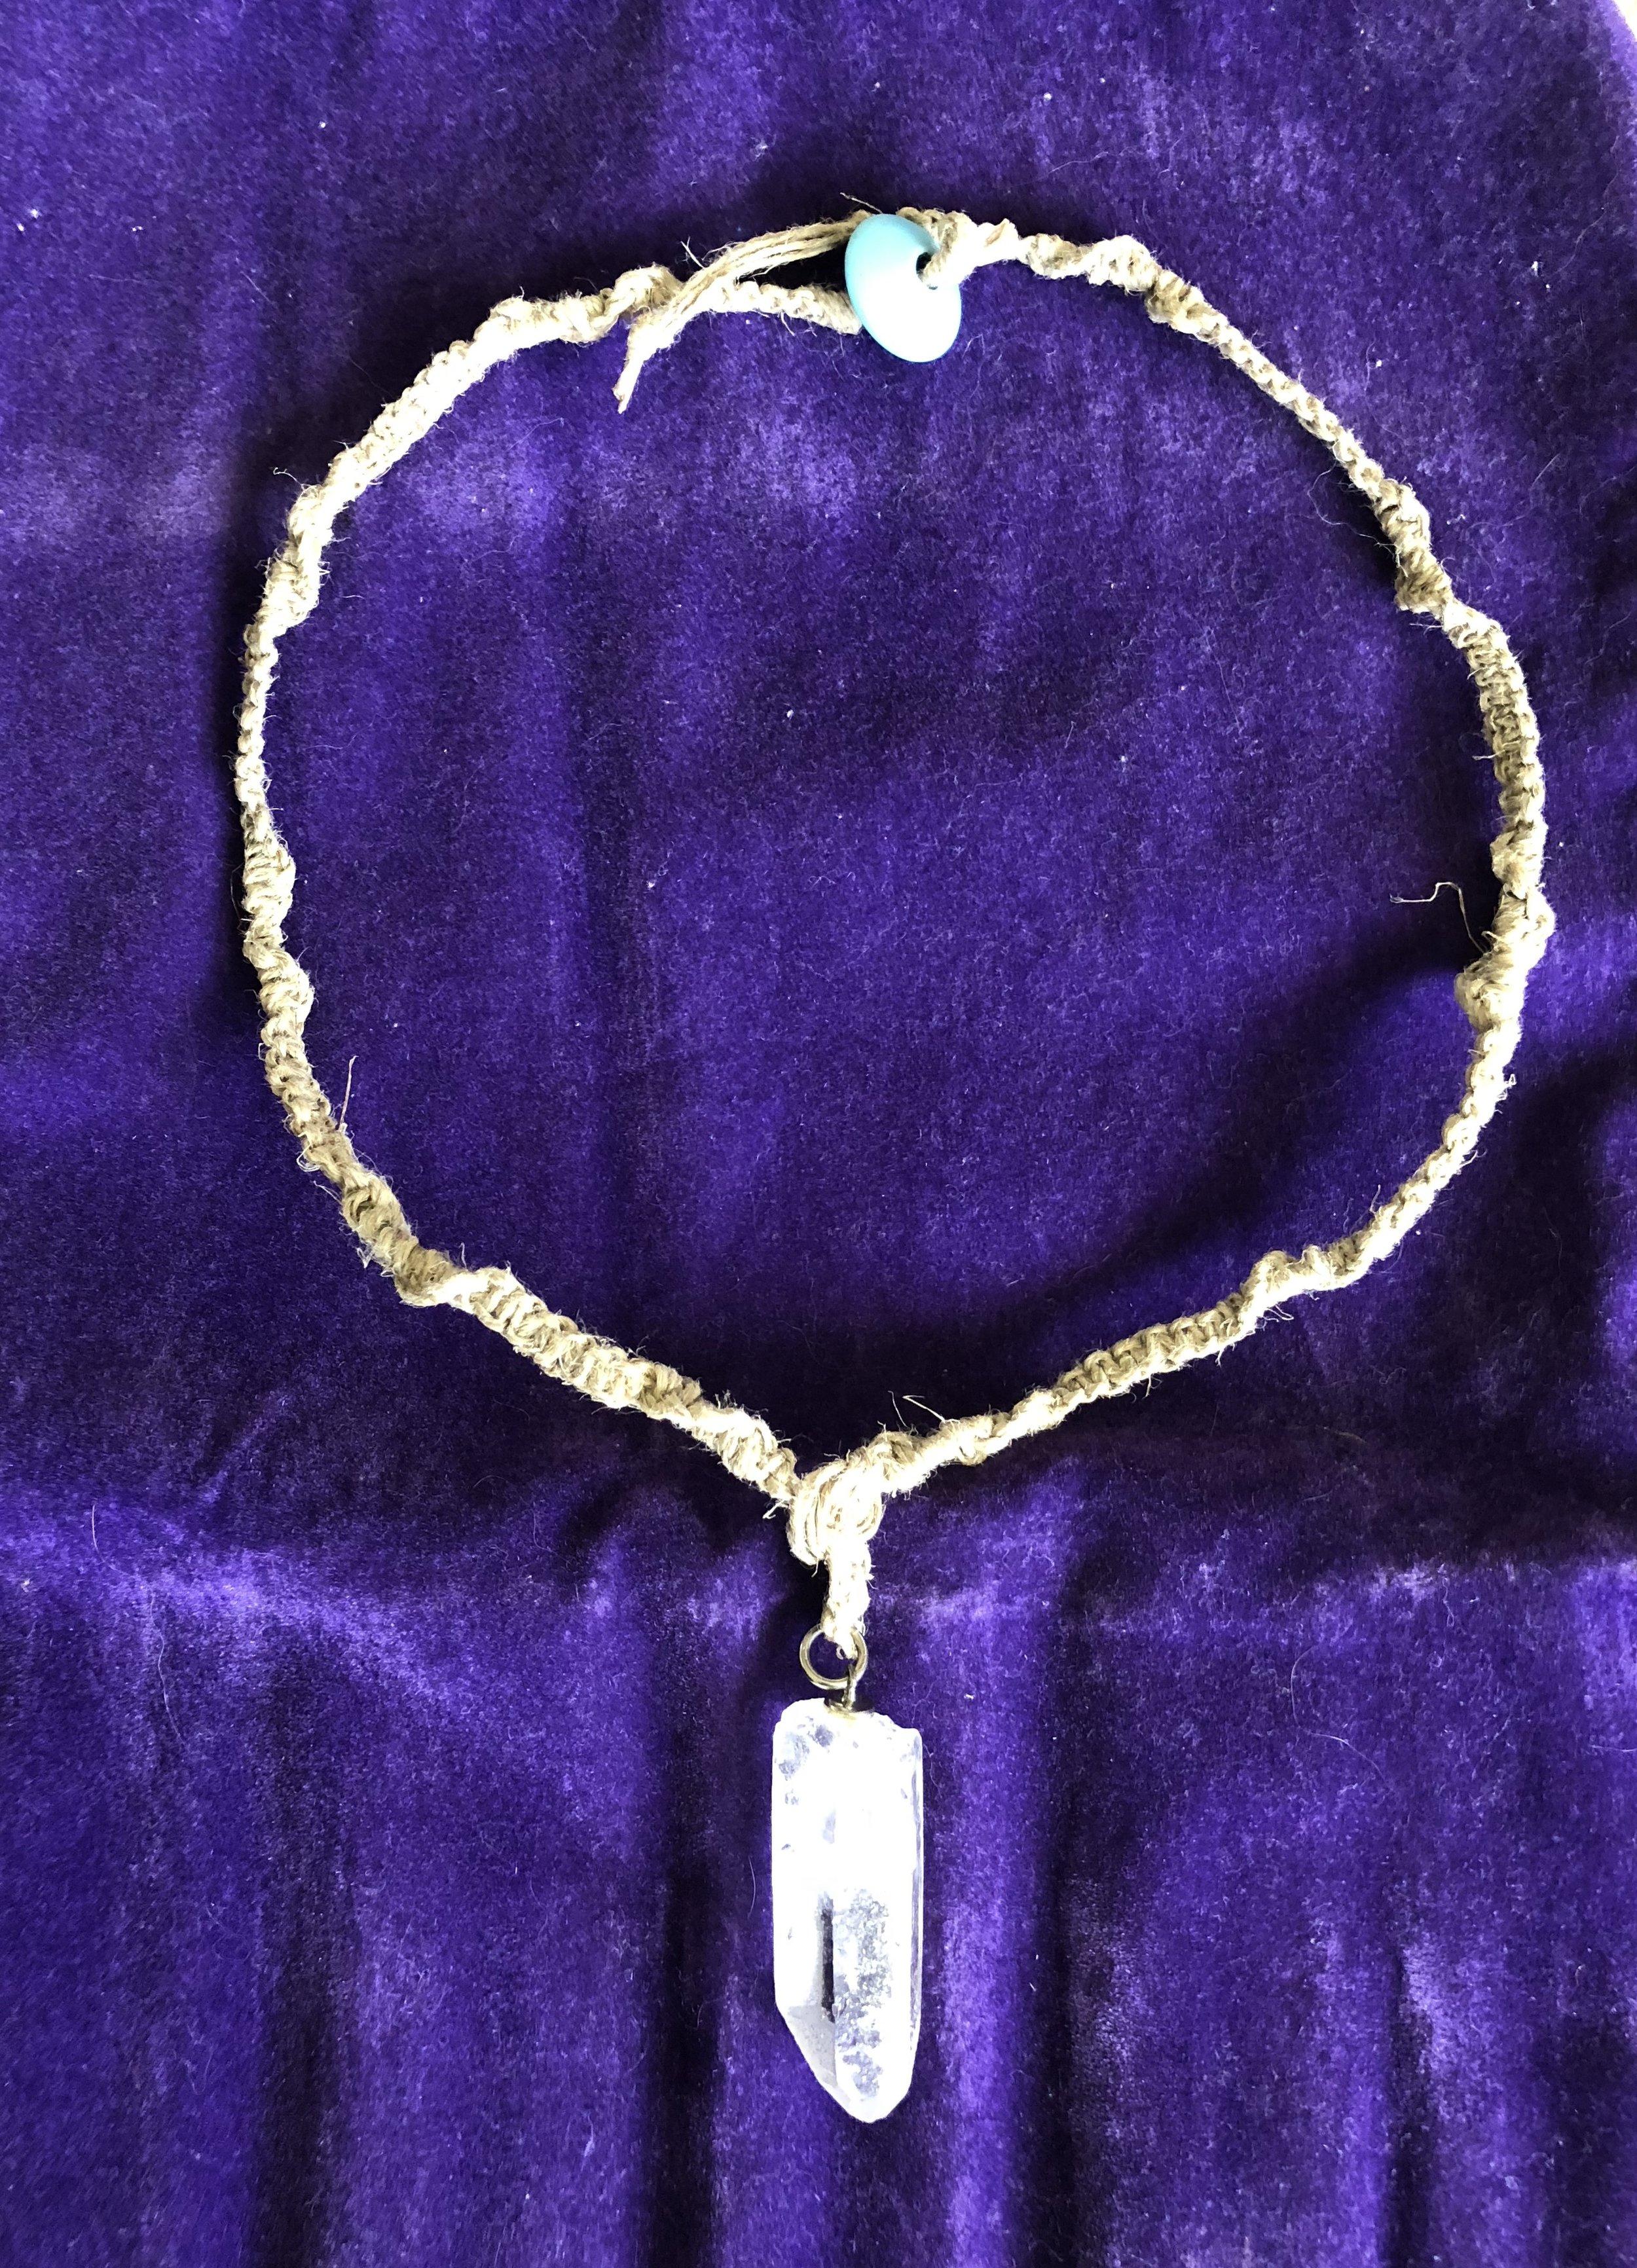 Clear-Quartz-Necklace-for-Mothers-Day-Lisa-Alexander.jpg